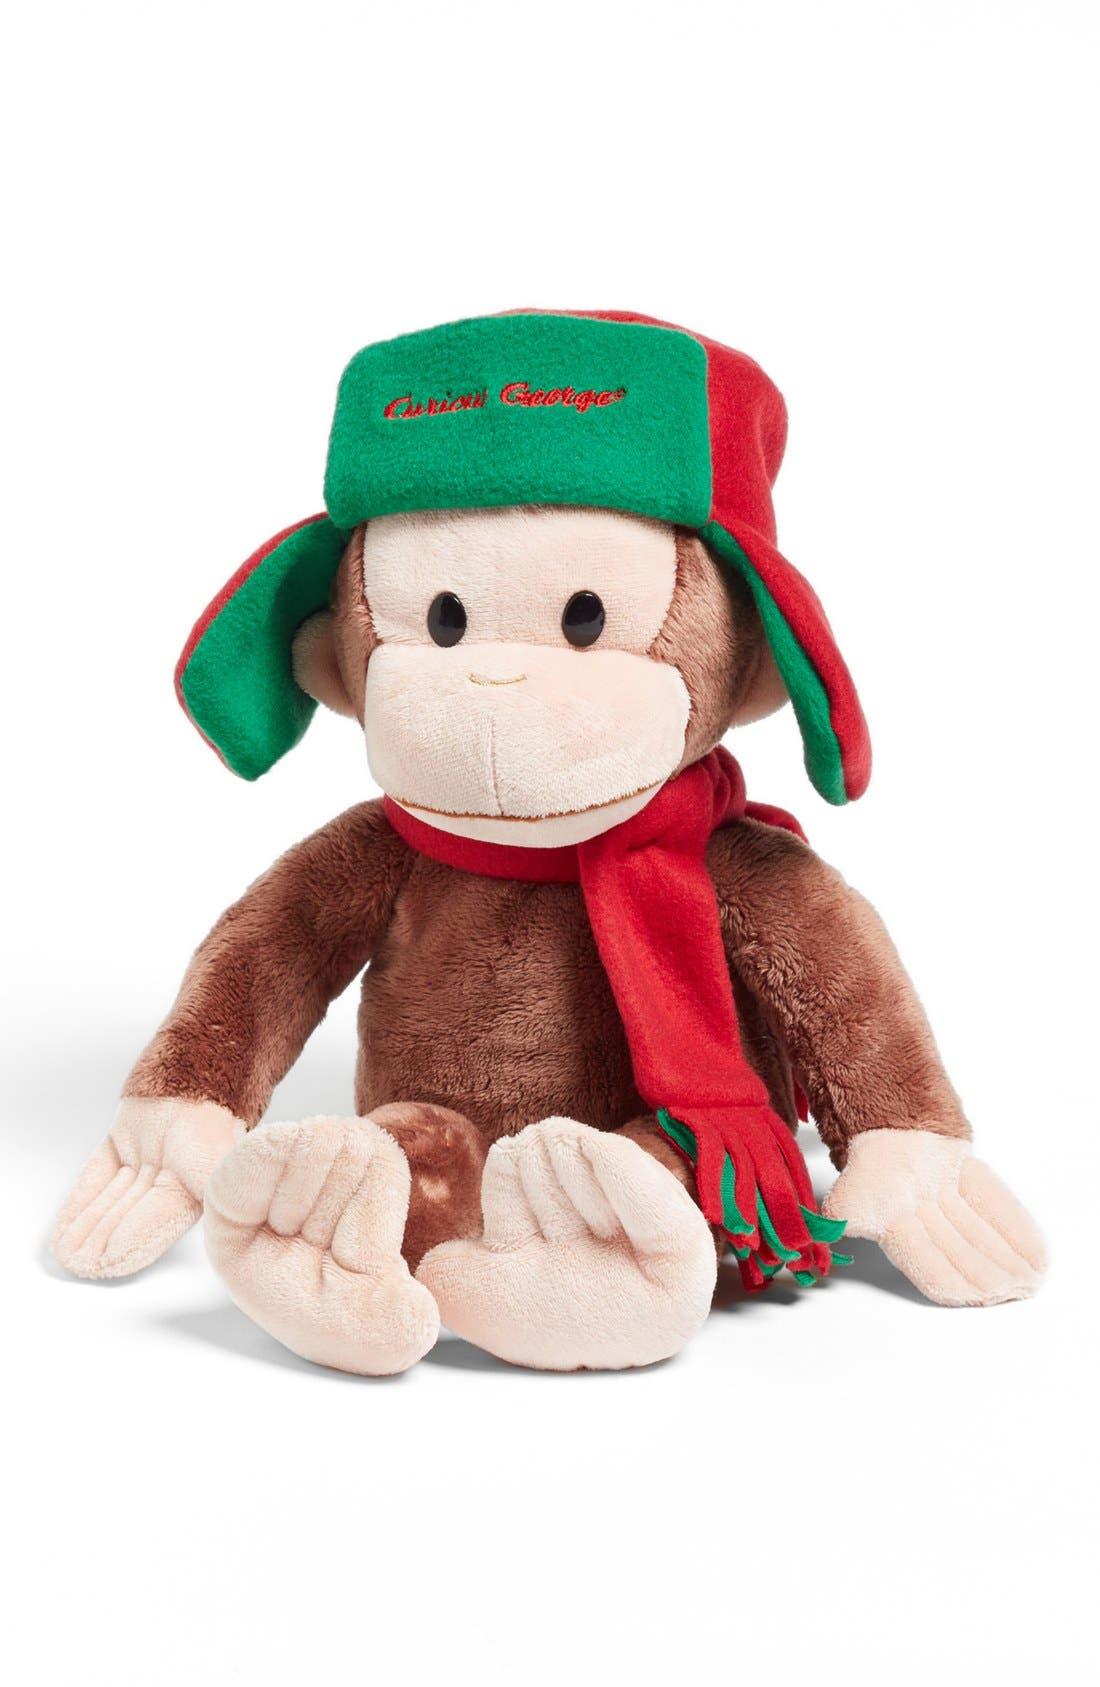 Main Image - Gund 'Curious George™ Trapper' Stuffed Animal